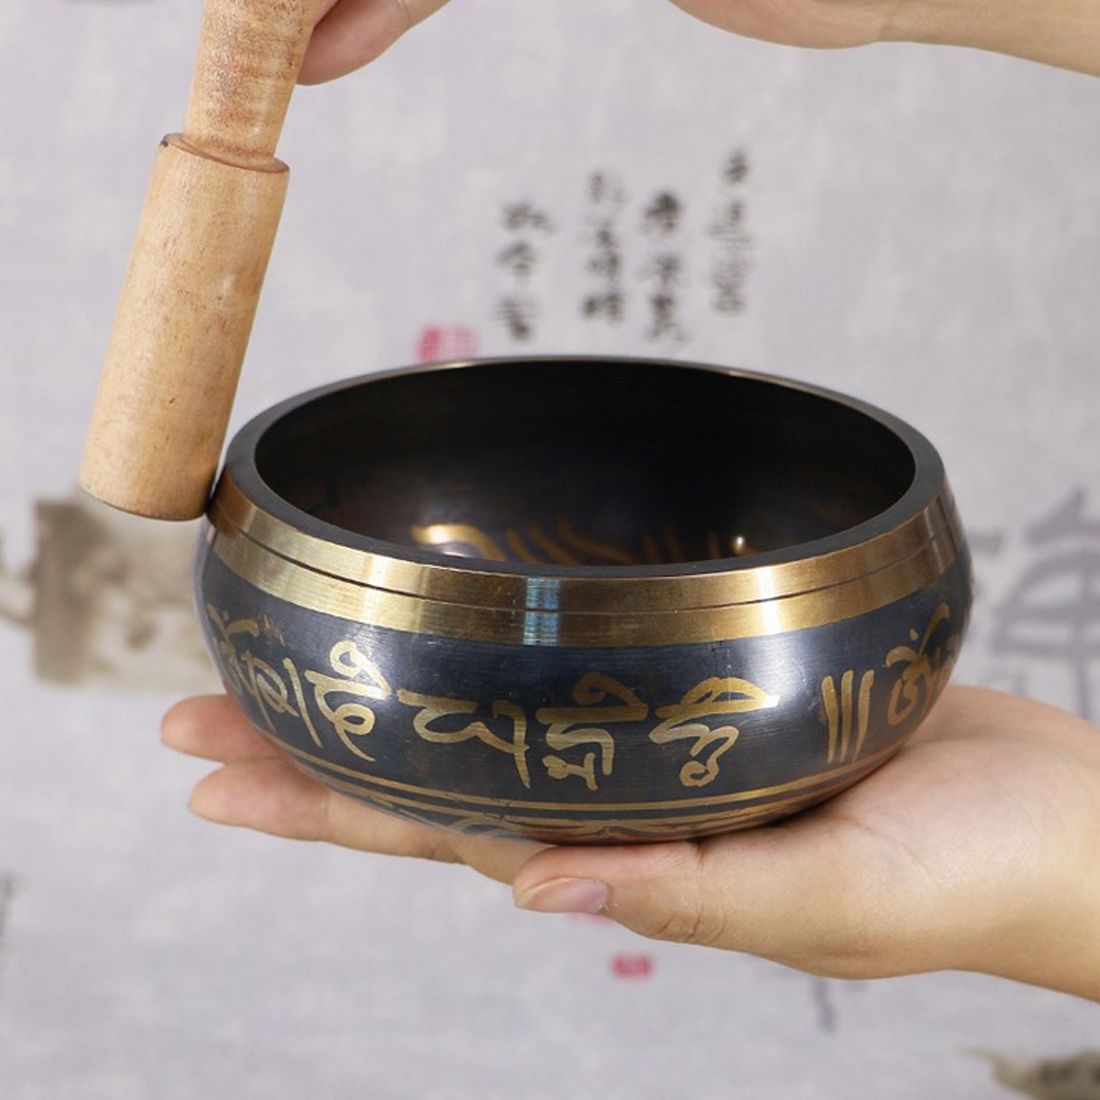 Yoga Tibetan Singing Bowl Decorative-wall-dishes Home Decoration Decorative Wall Dishes Hammered Meditation